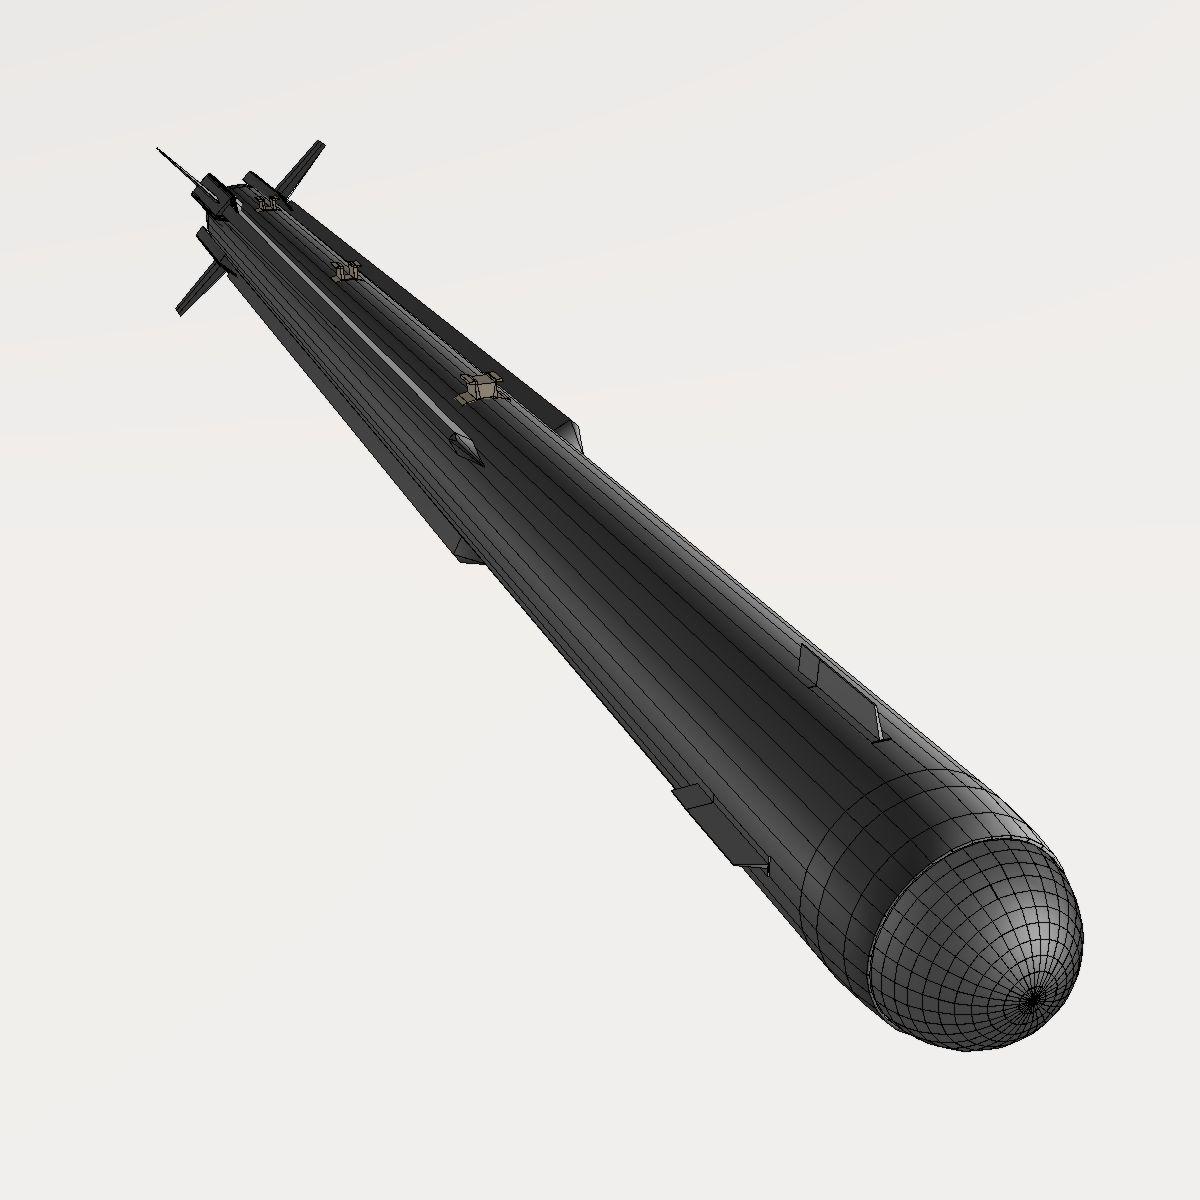 a-darter air-to-air пуужин 3d загвар 3ds dxf cob x obj 151891